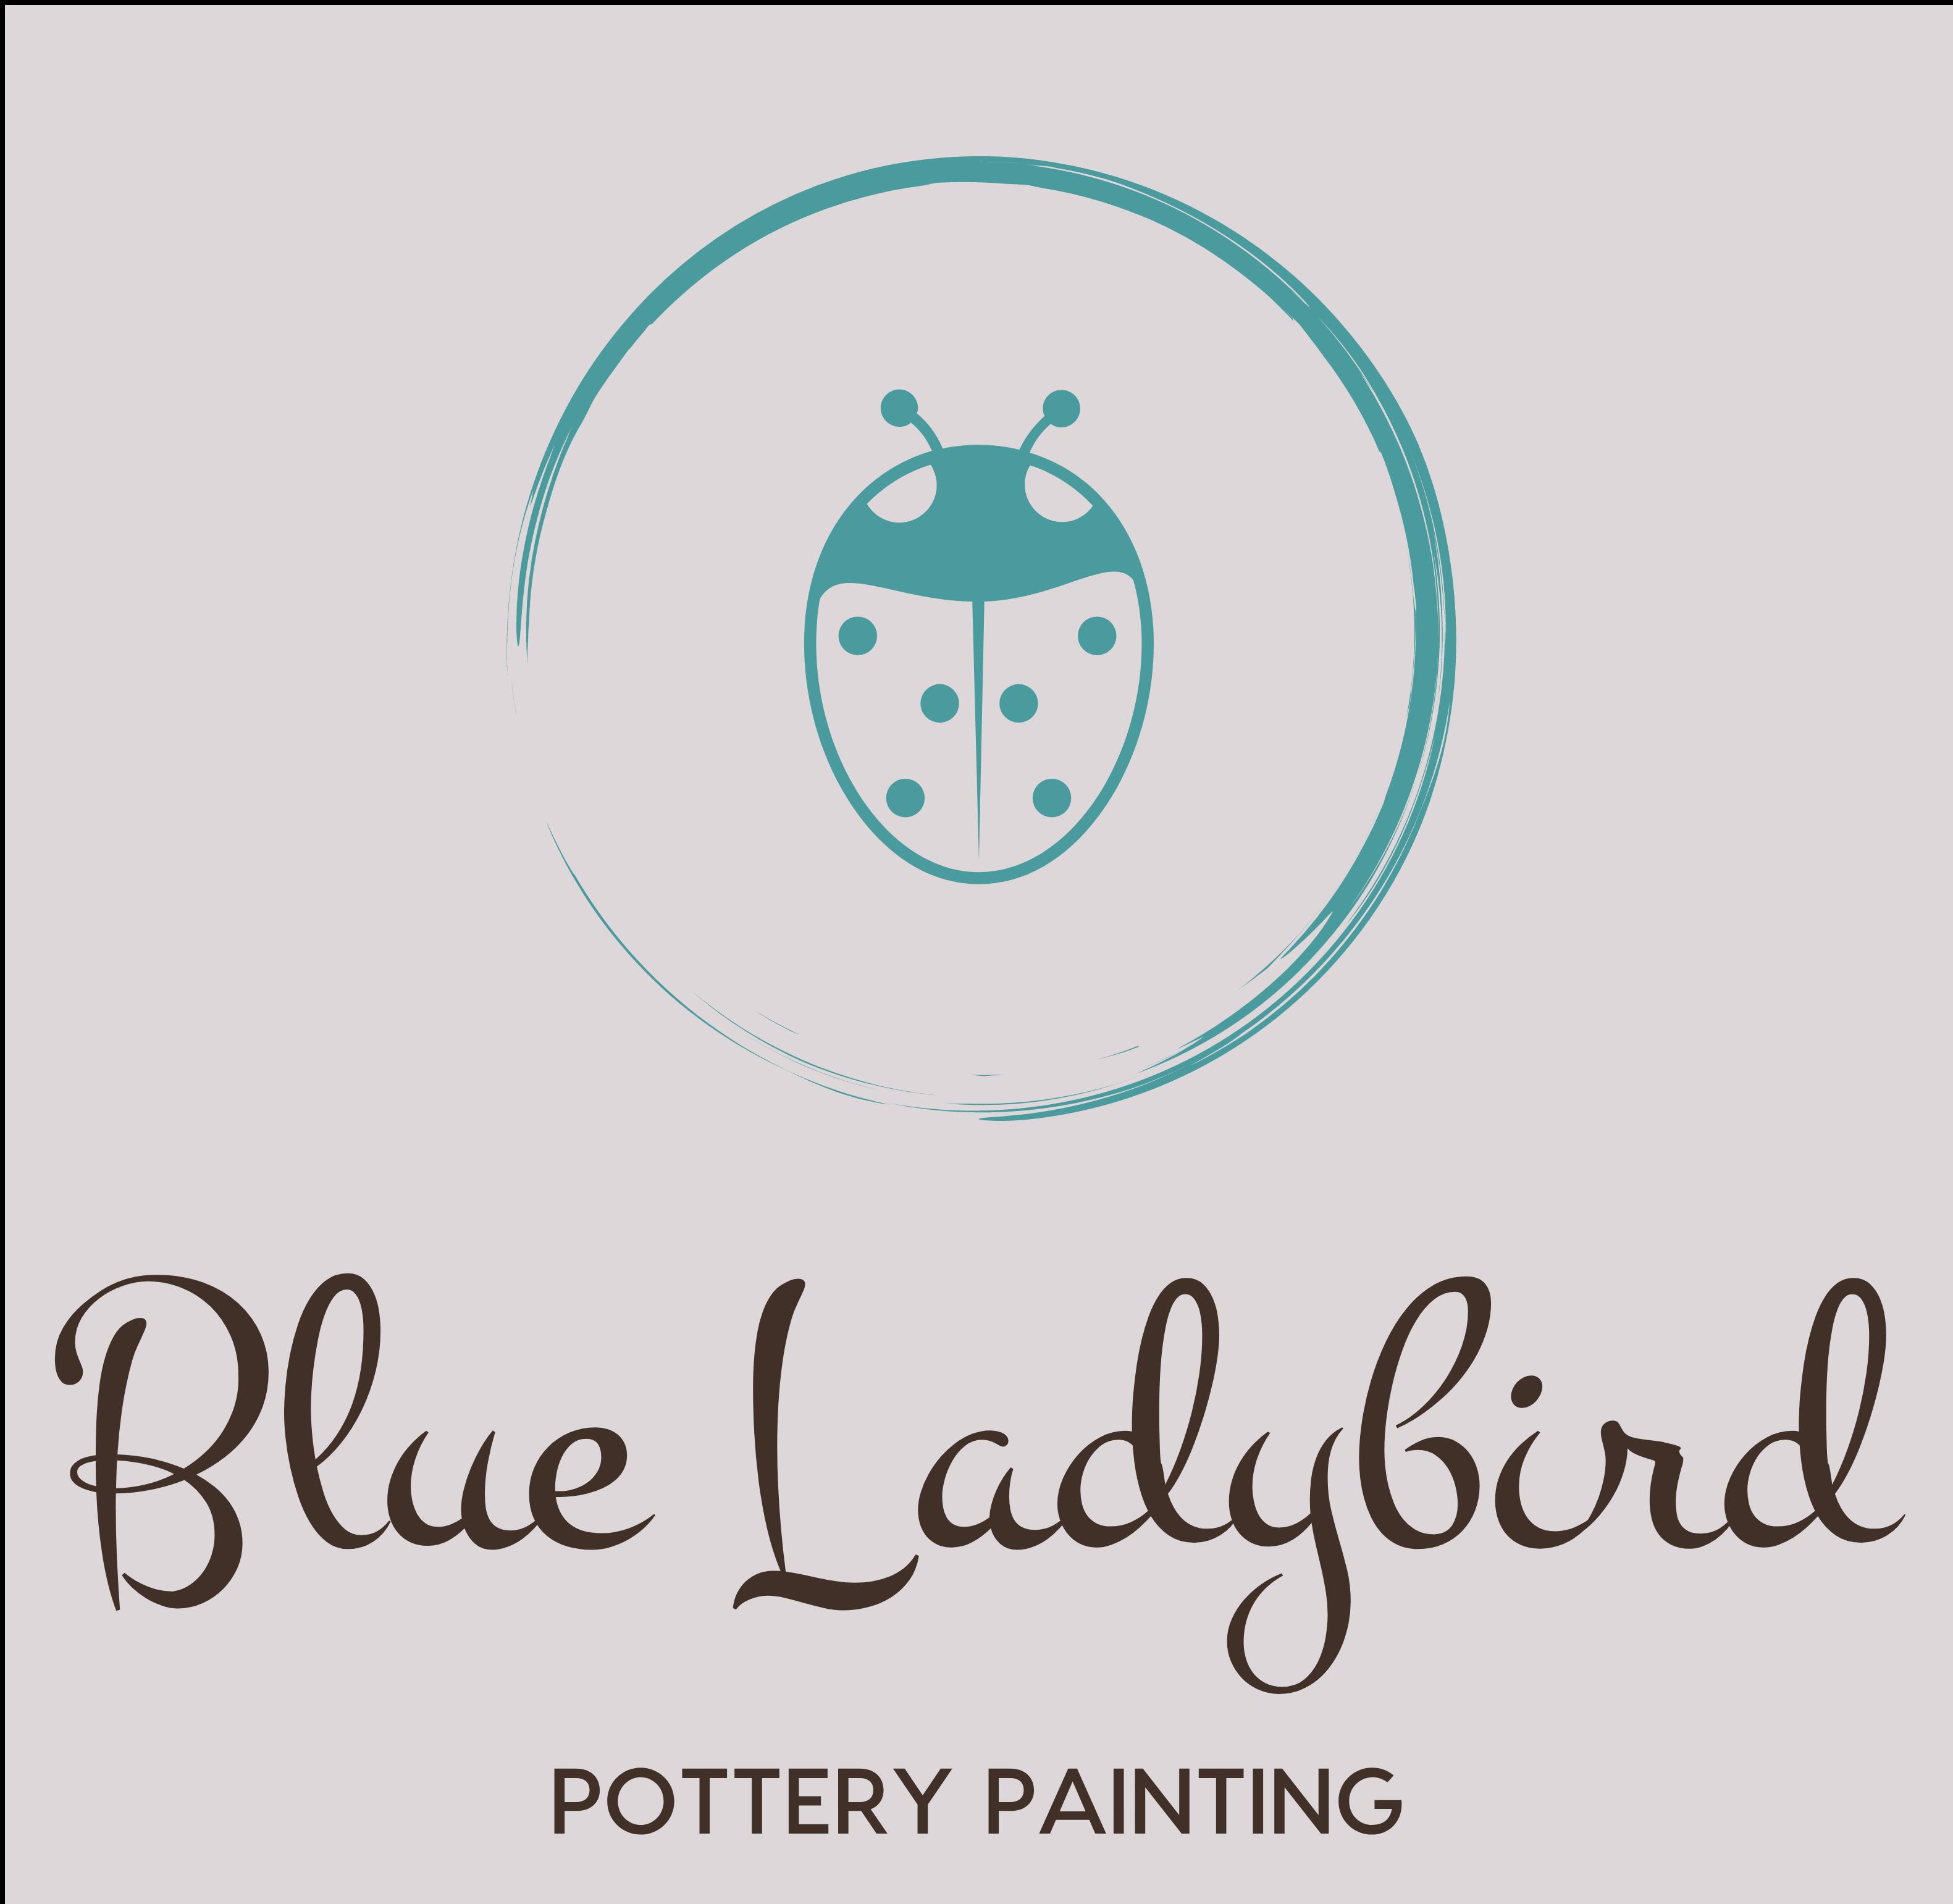 The Blue Ladybird Pottery's logo